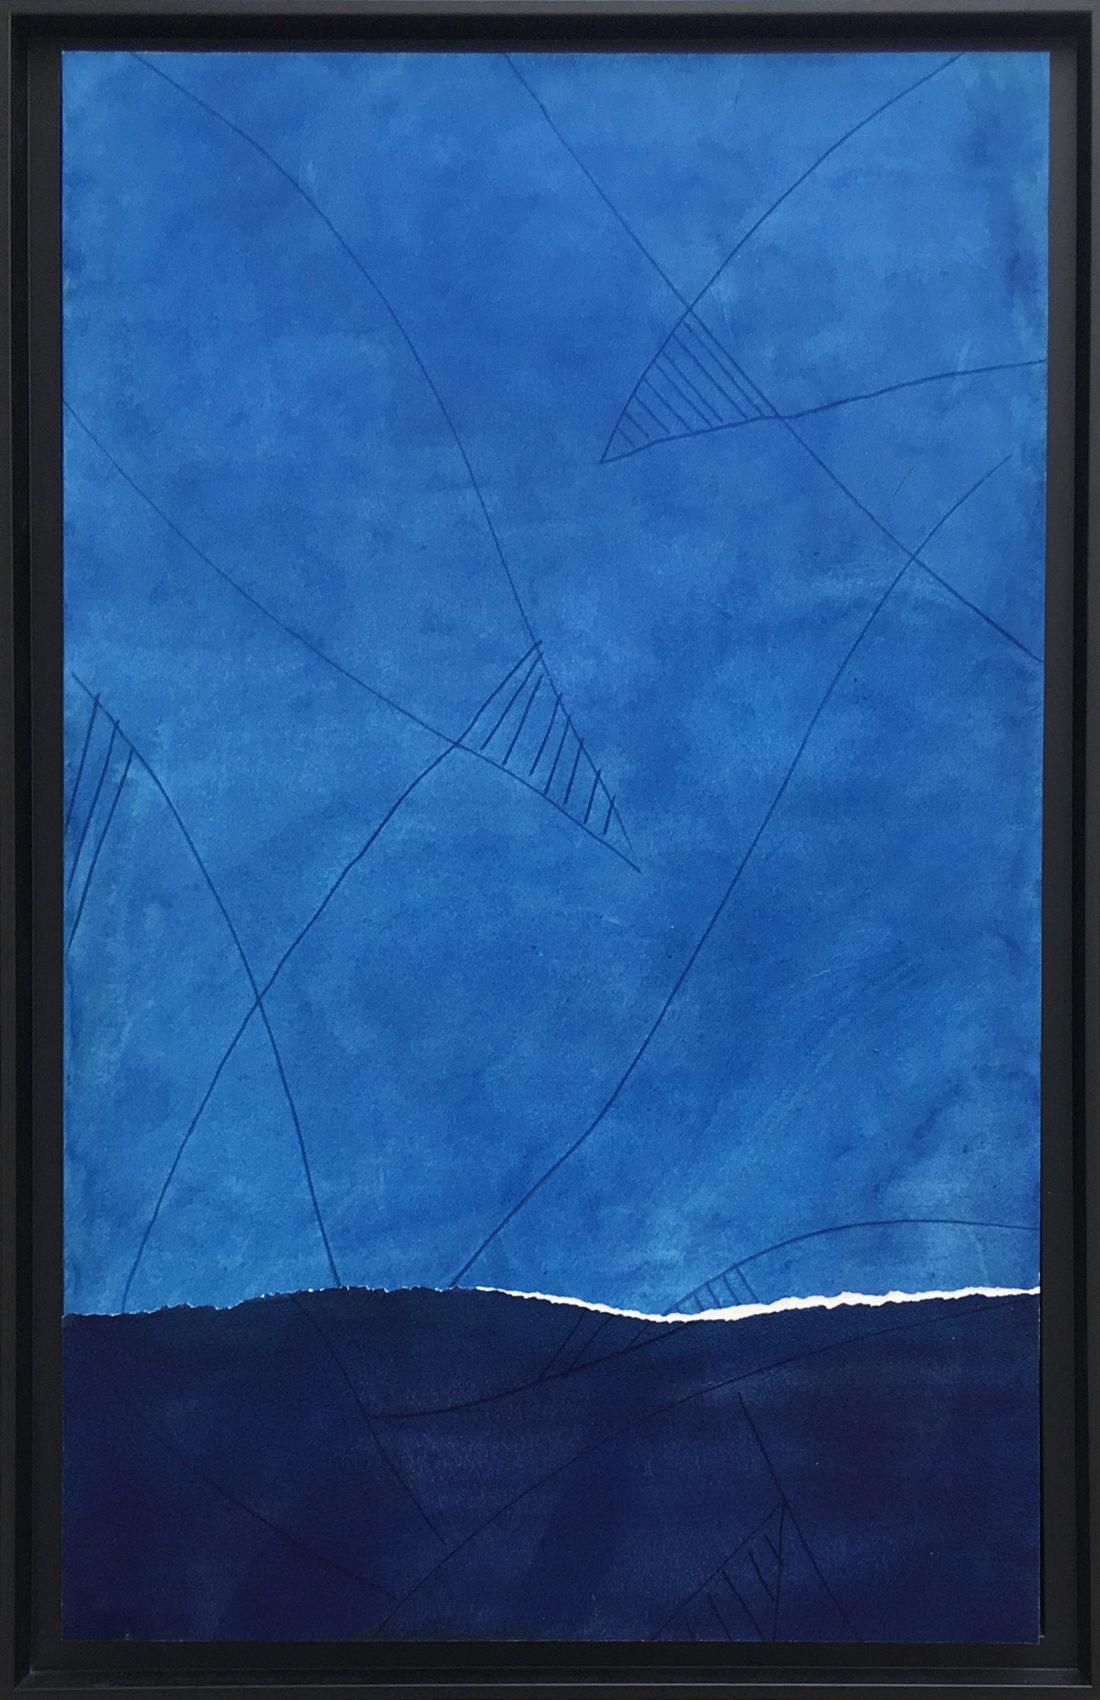 Oeuvre sur papier - Bernard Gortais - Continuum 122